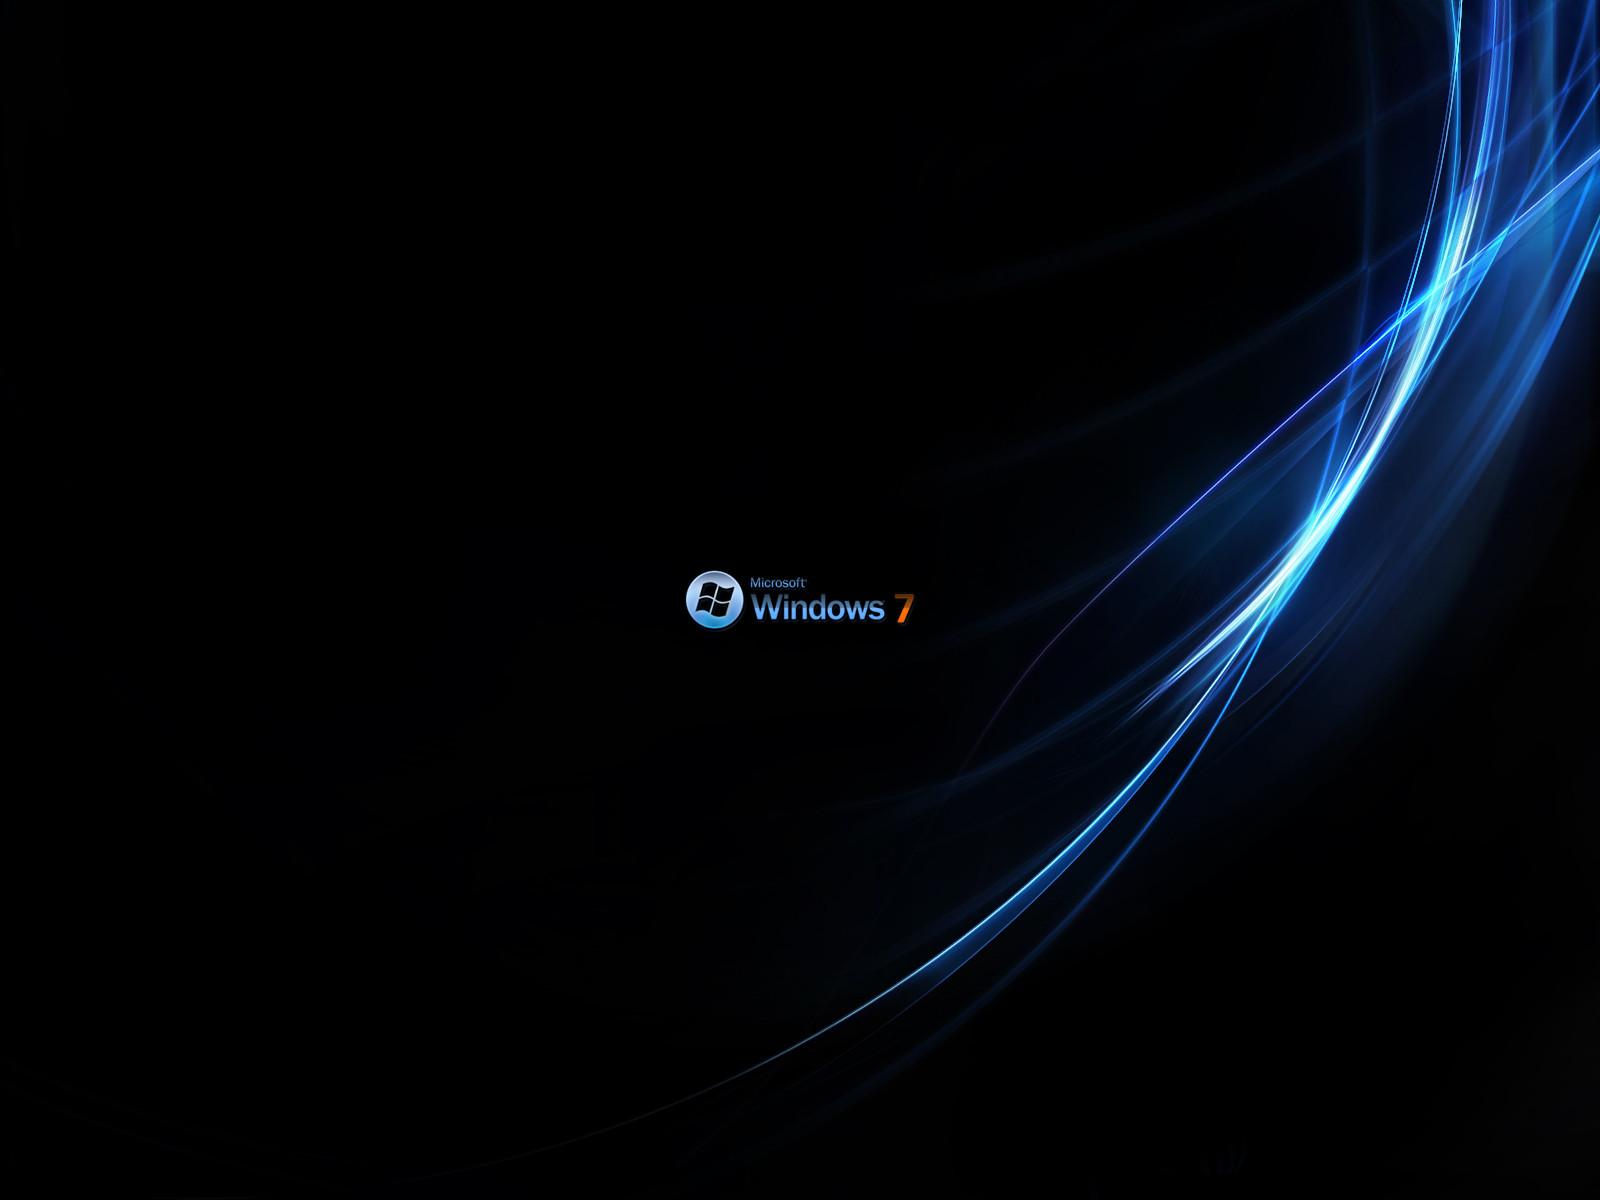 http://1.bp.blogspot.com/-O1jvWJ79GOQ/Tyedo779ZII/AAAAAAAADNE/iBIUZPjSK-s/s1600/black-windows-7.jpg